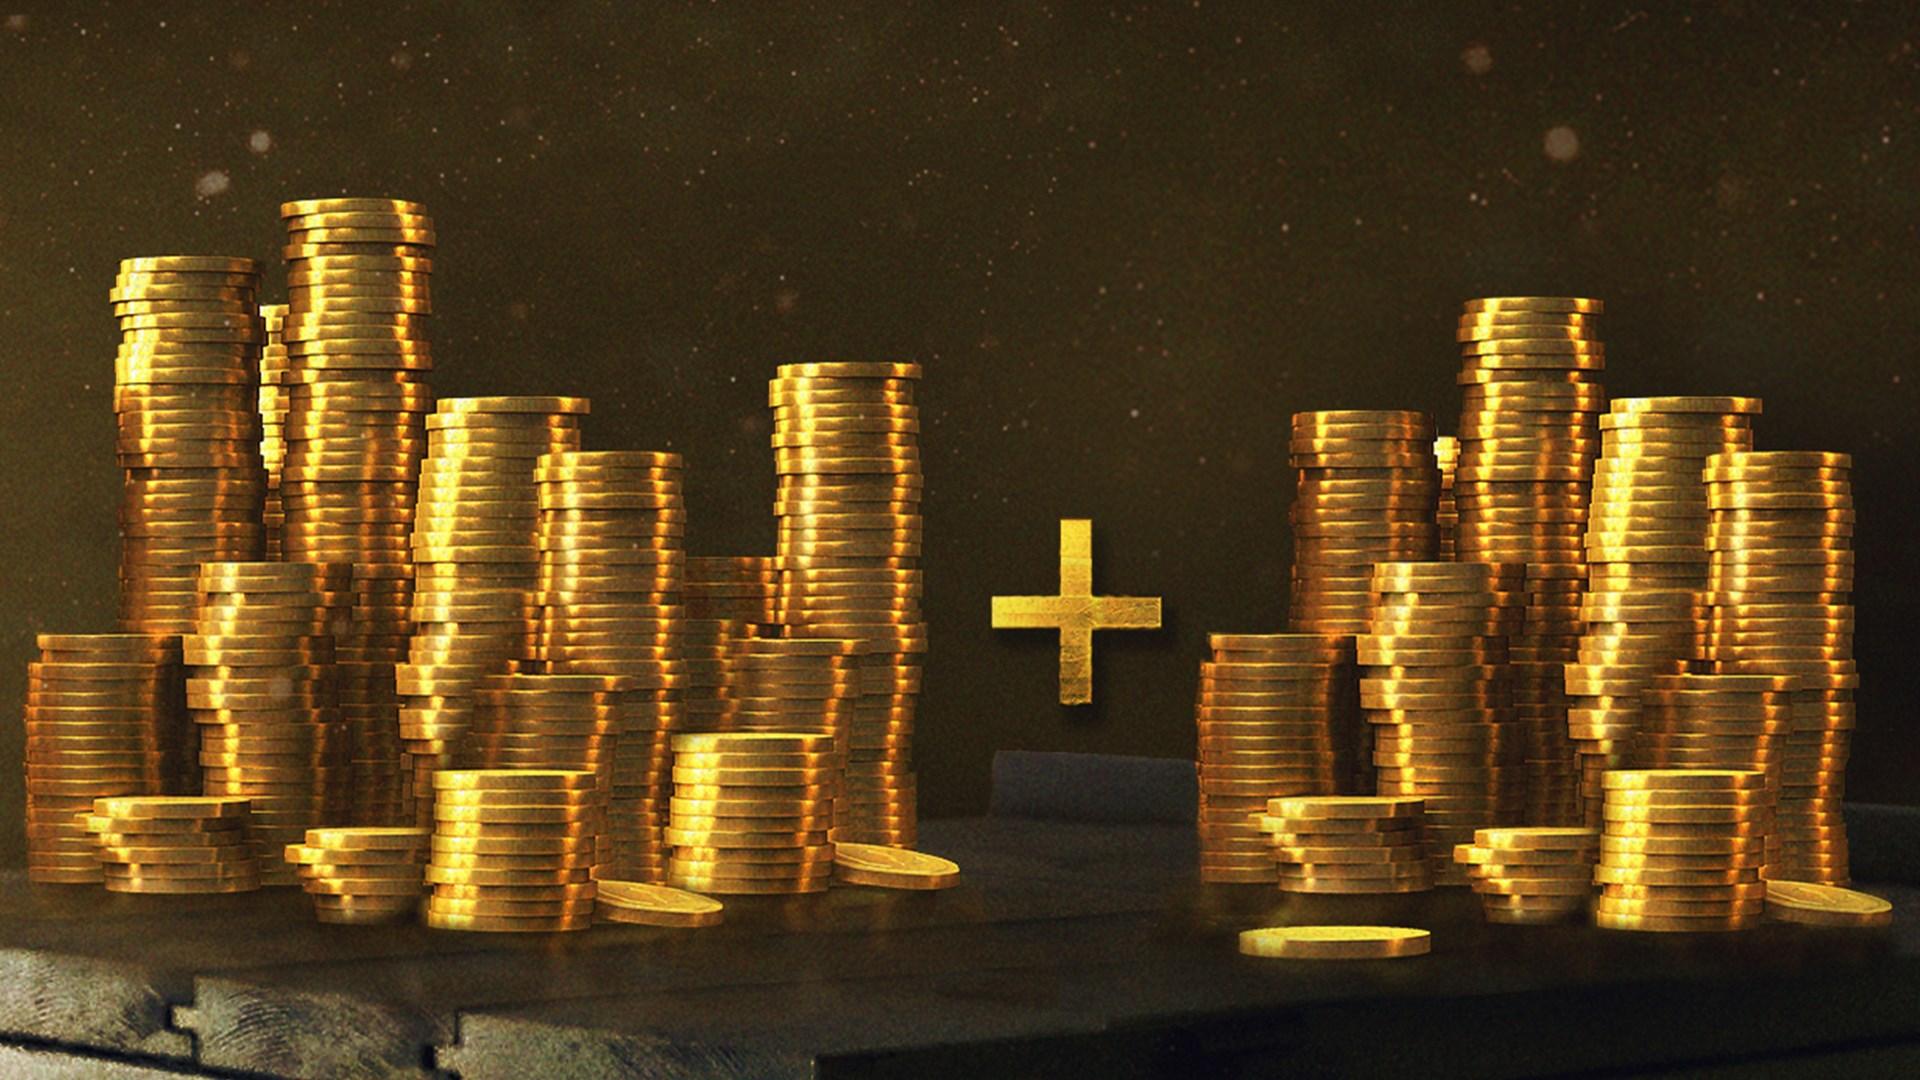 12,000 Gold